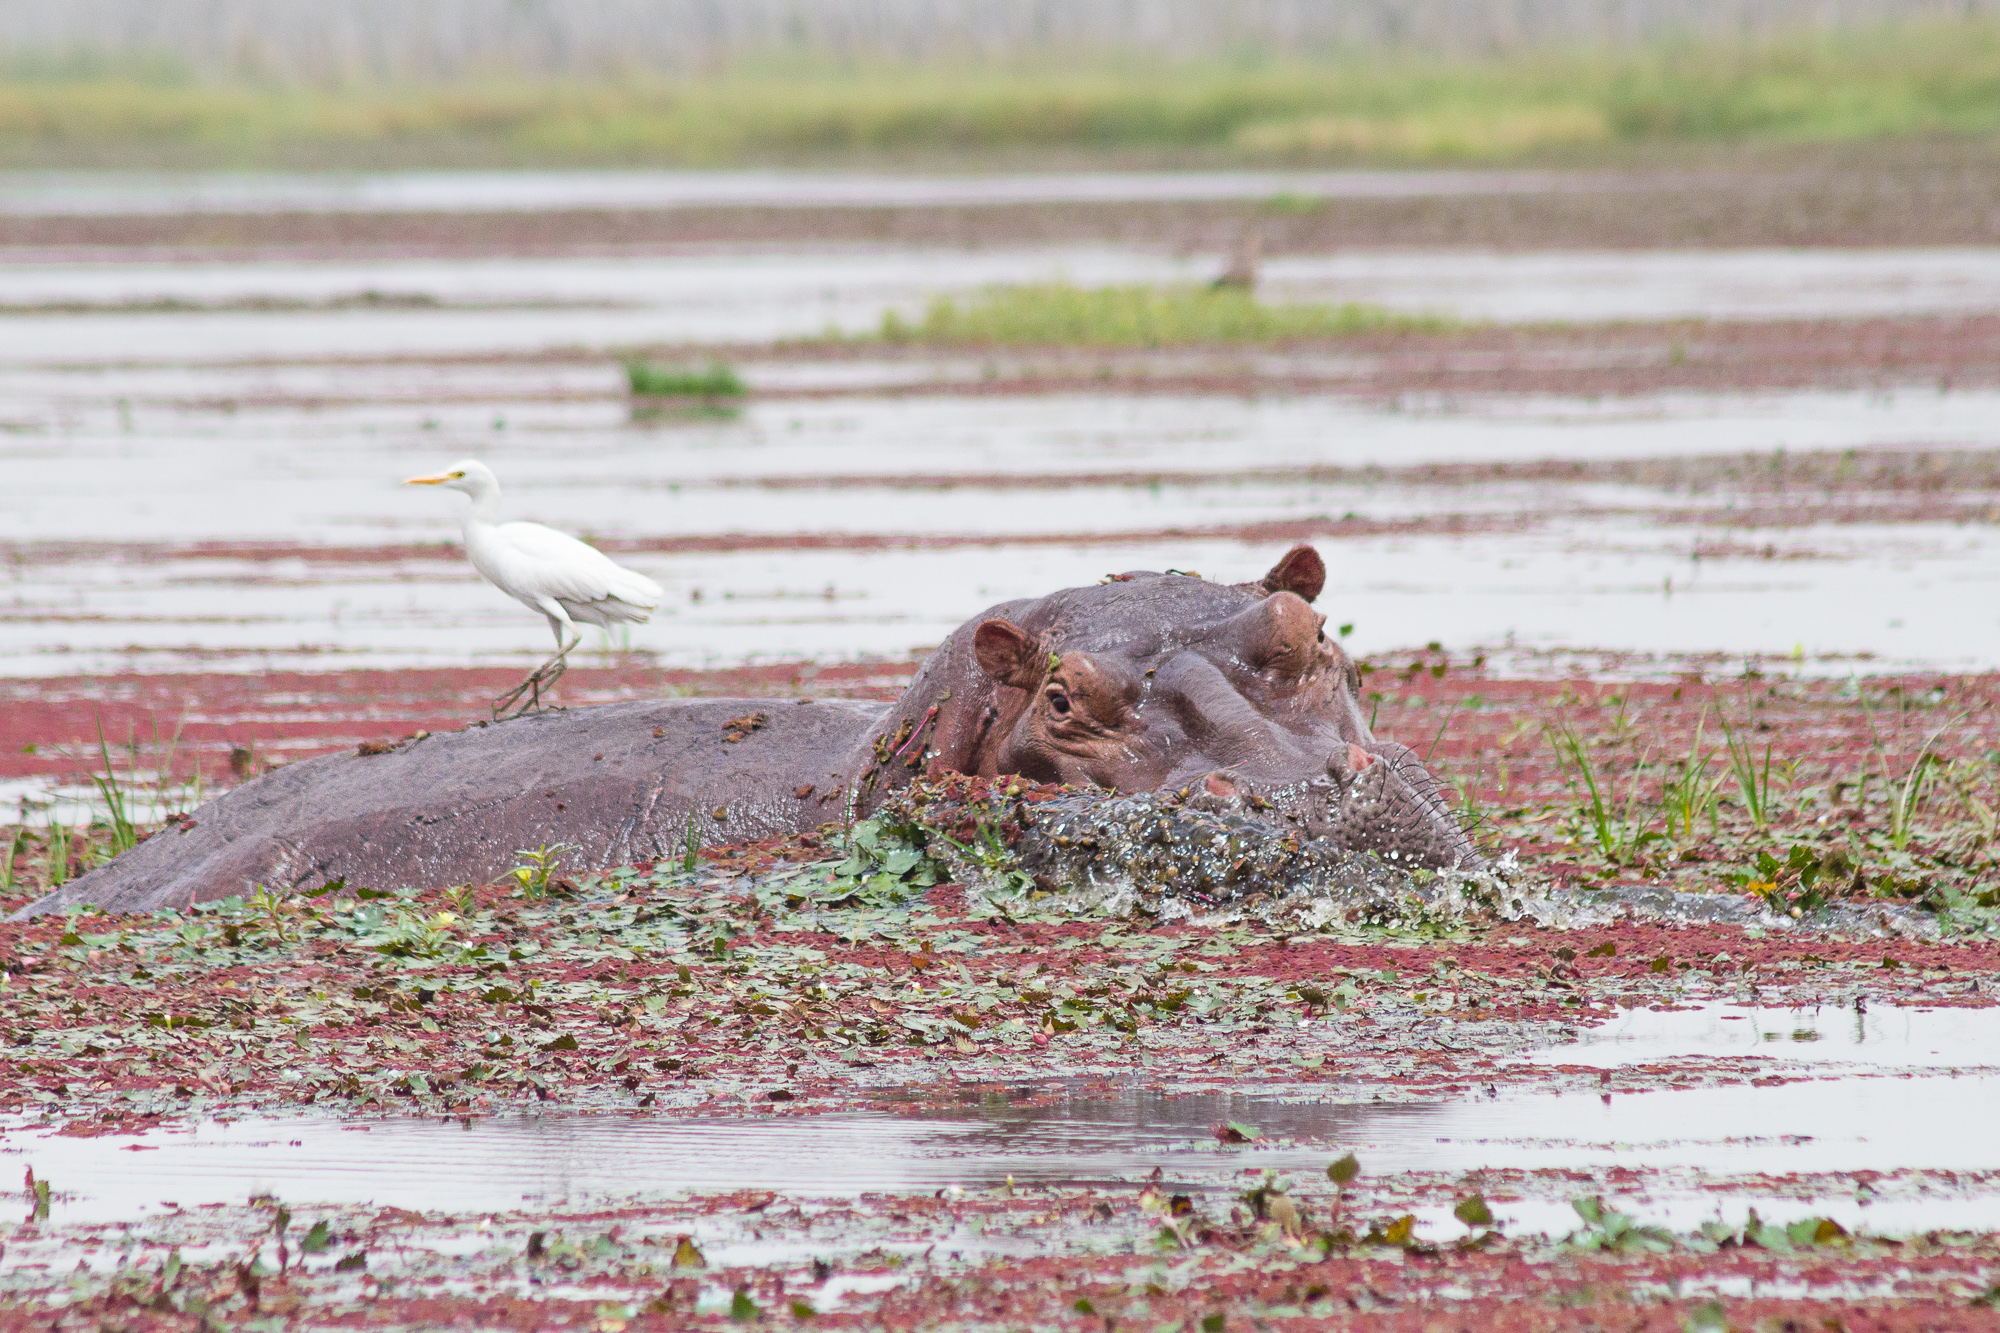 Hippopotame sortant de l'eau avec son oiseau pique-boeuf, mare de Bala, Burkina Faso